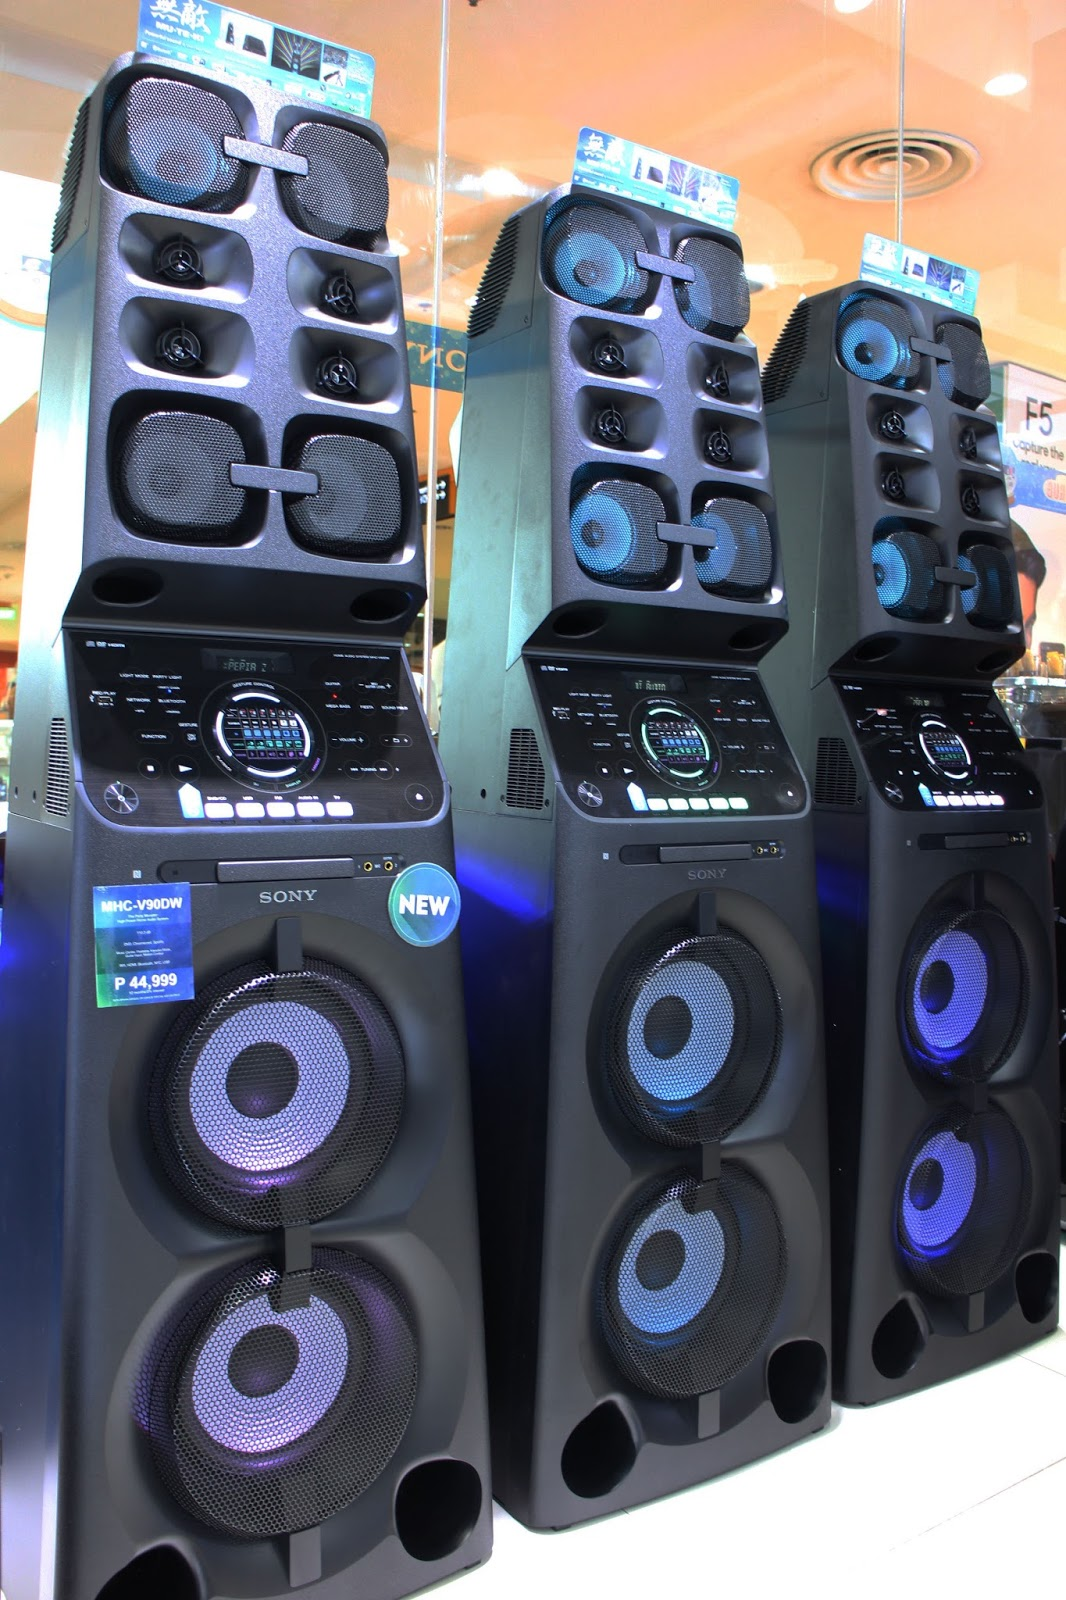 oc craft sony new high power audio system muteki mhc v90dw. Black Bedroom Furniture Sets. Home Design Ideas